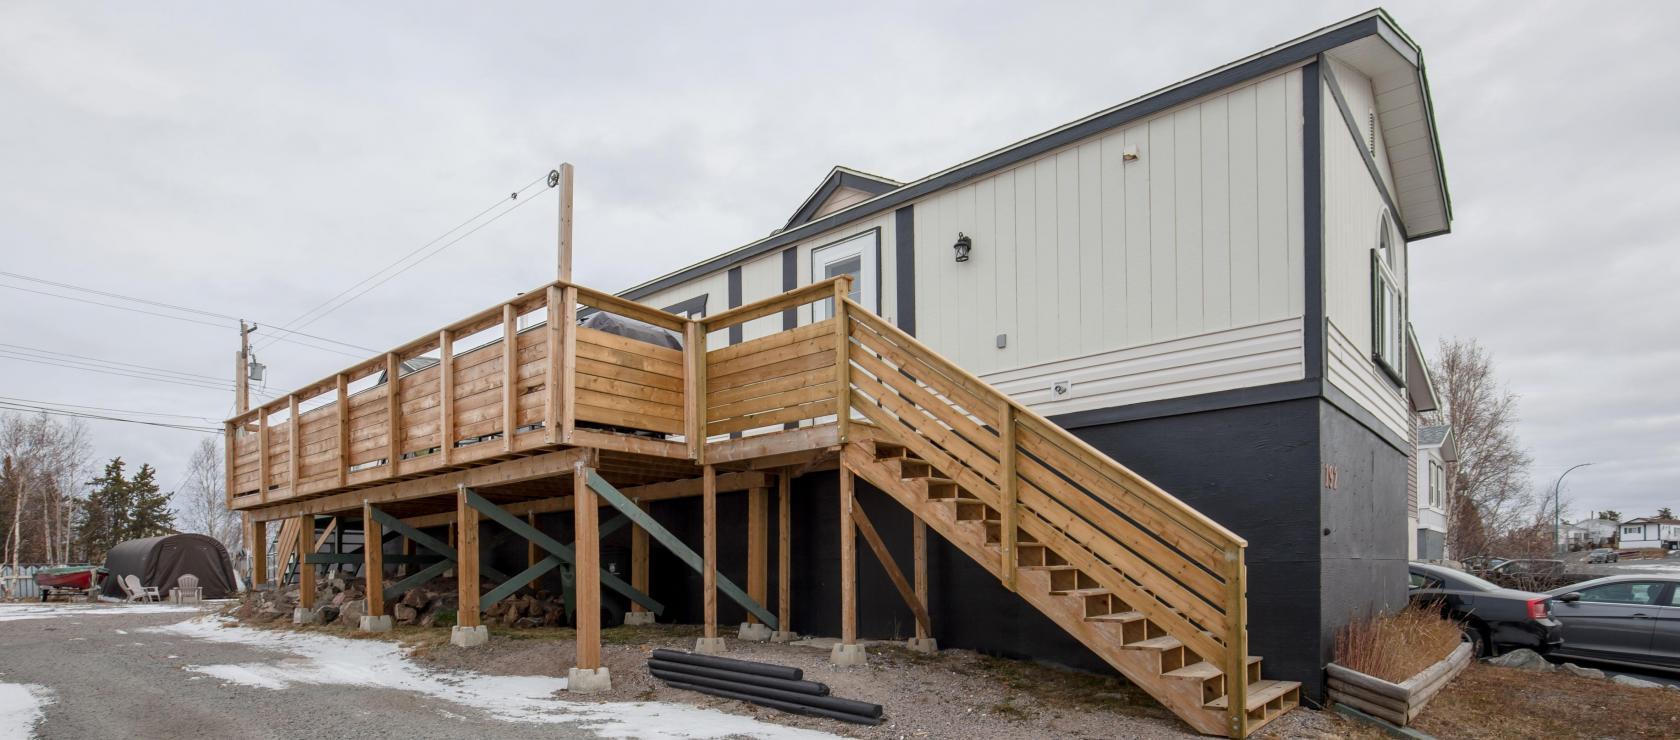 192 Jeske Crescent, Range Lake, Yellowknife 2